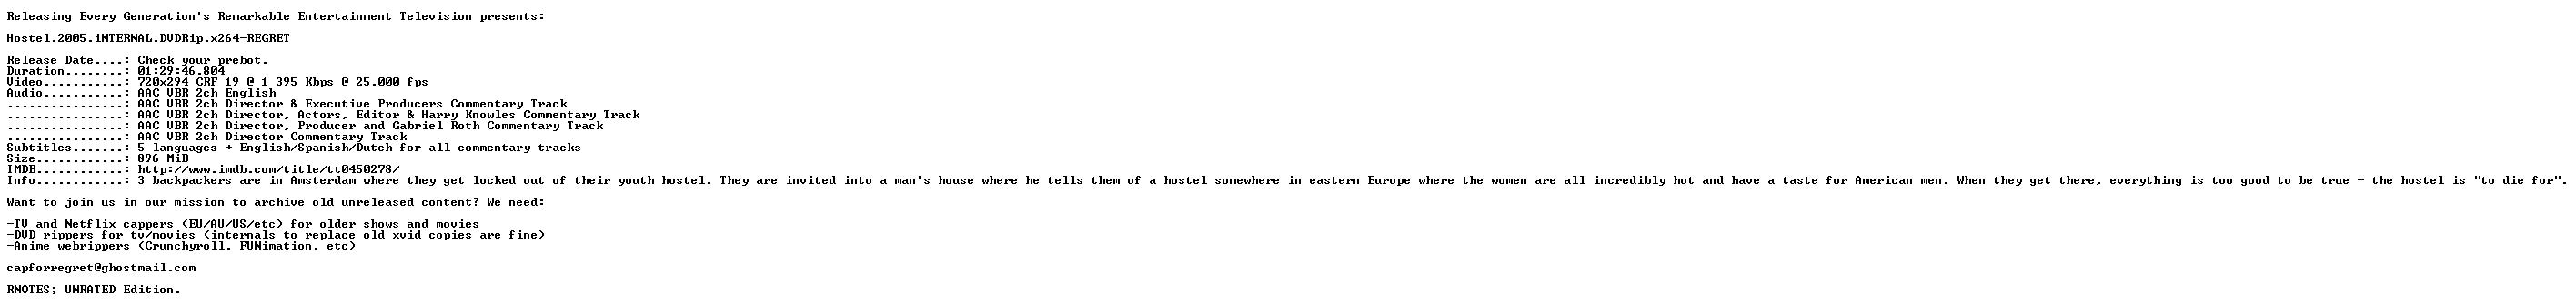 Hostel 2005 iNTERNAL DVDRip x264-REGRET